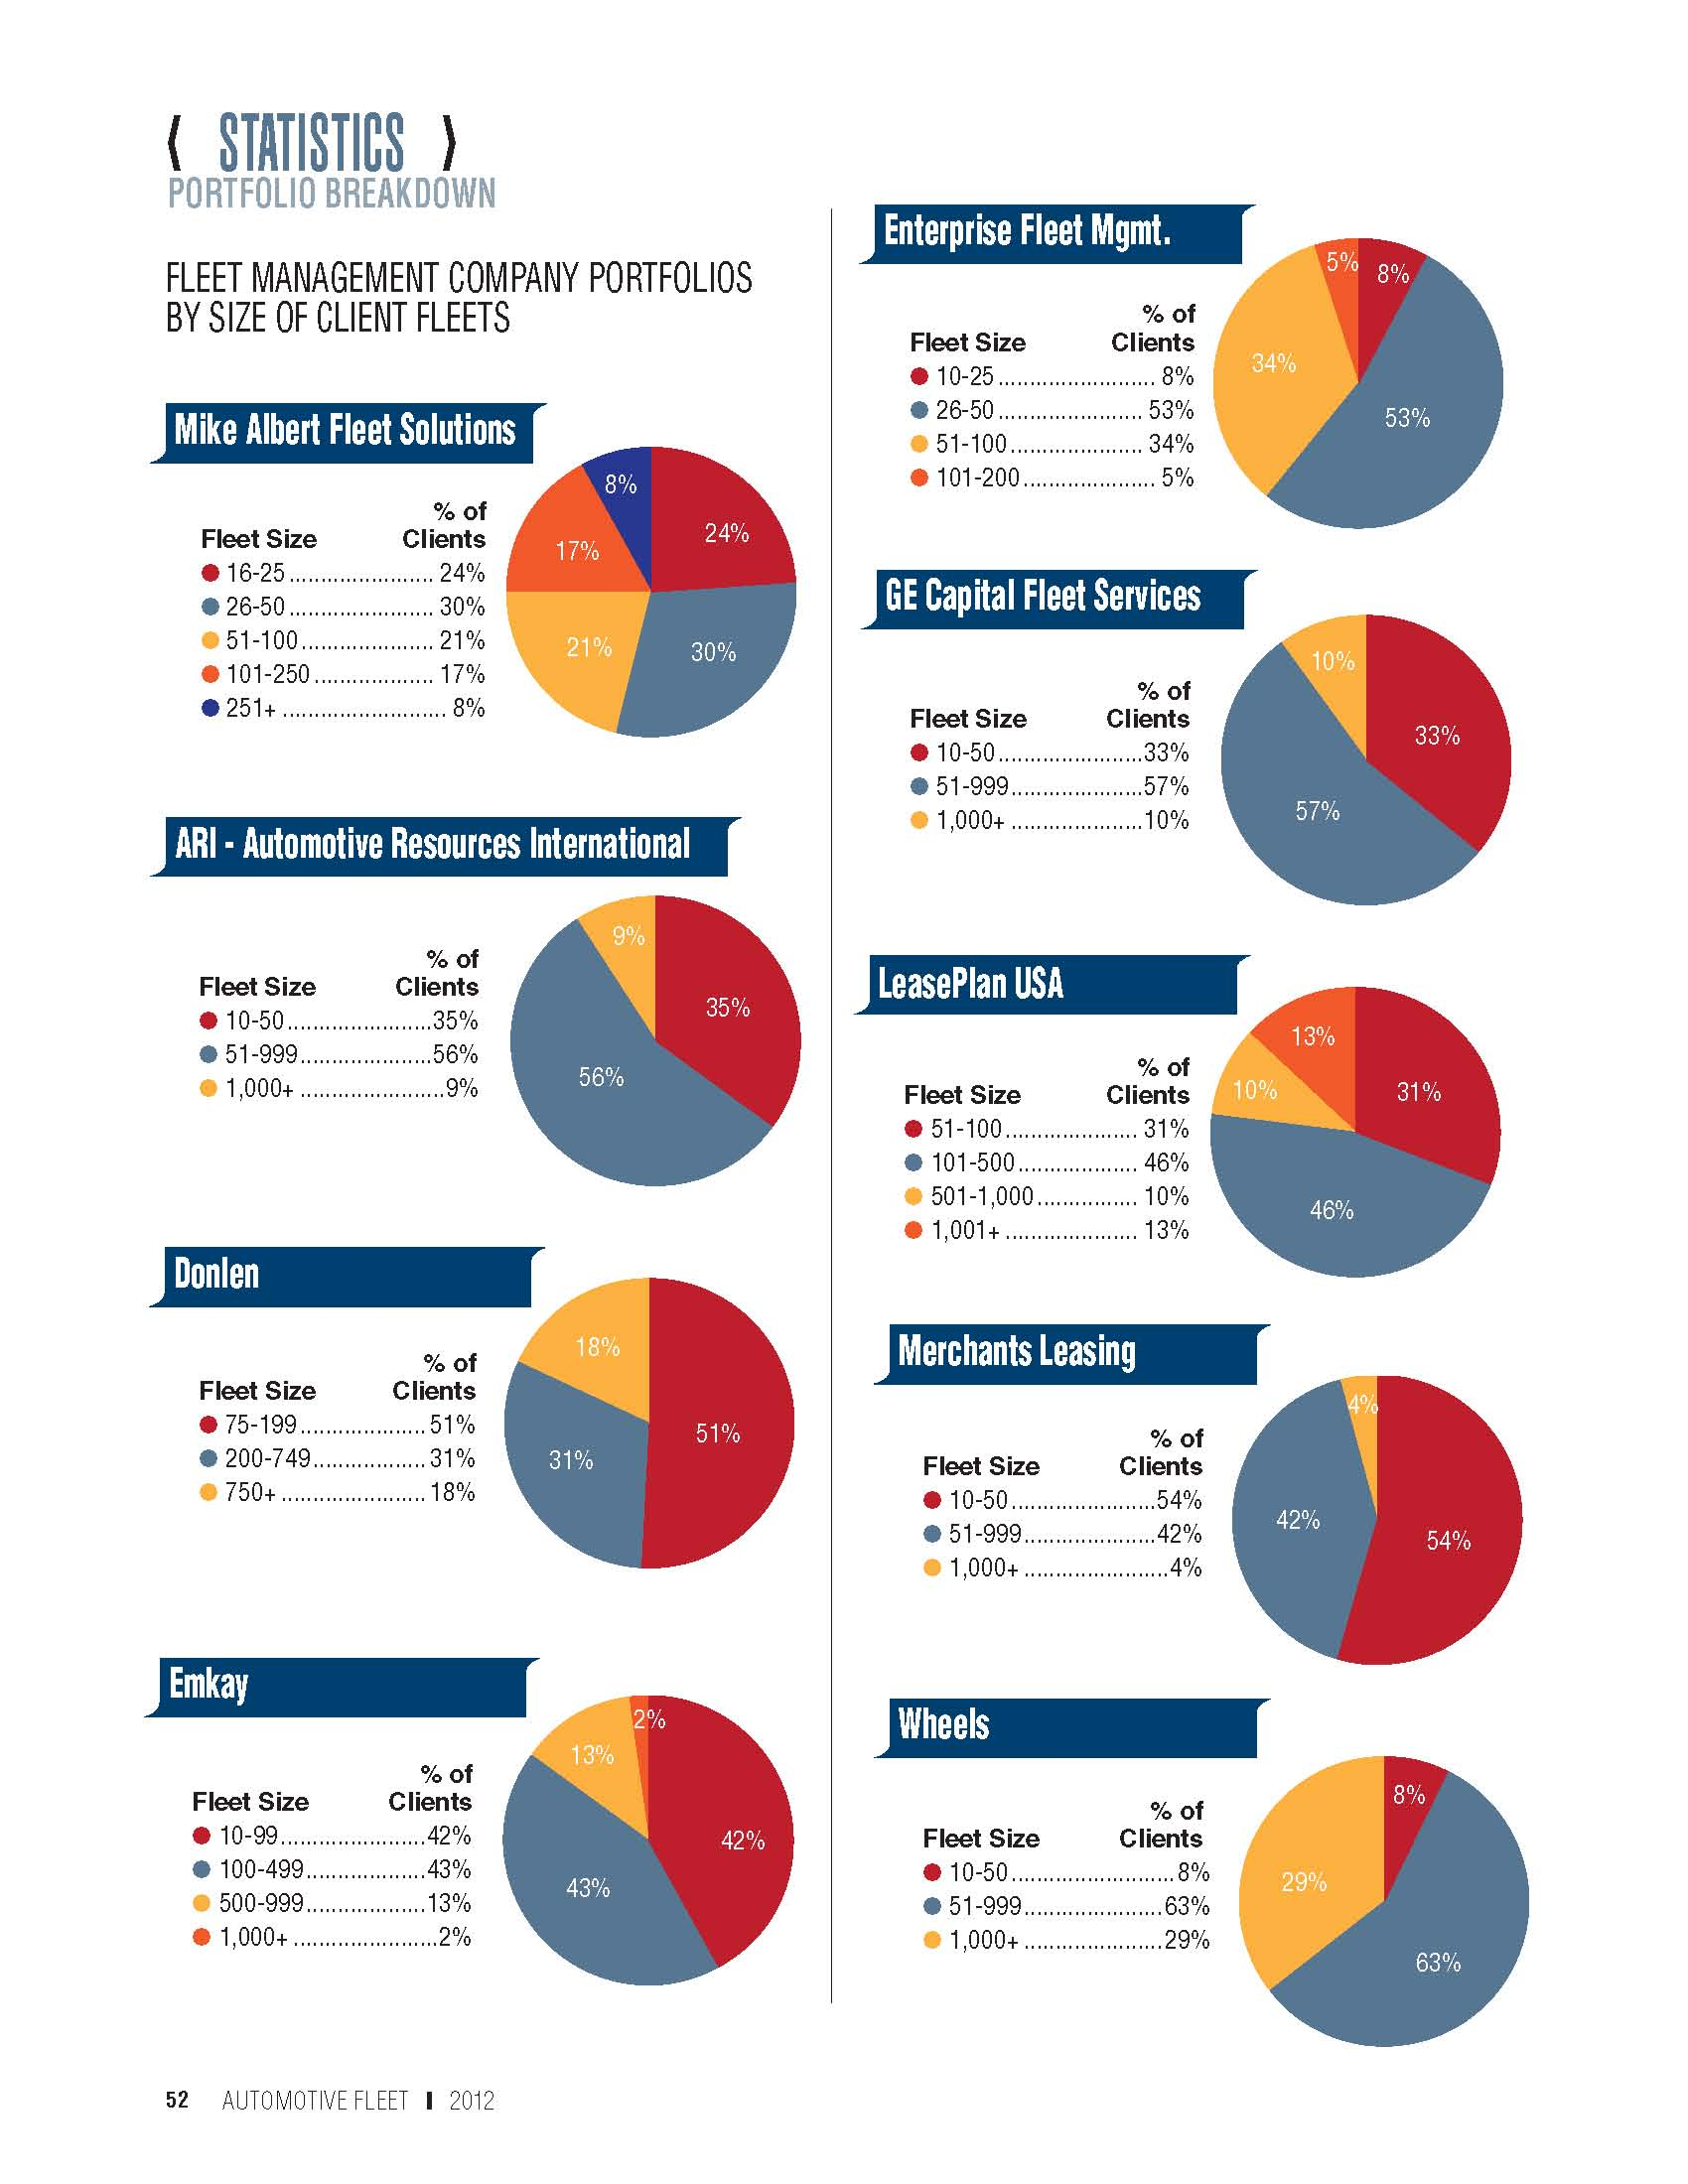 2011 Fleet Size in Lessor Portfolios